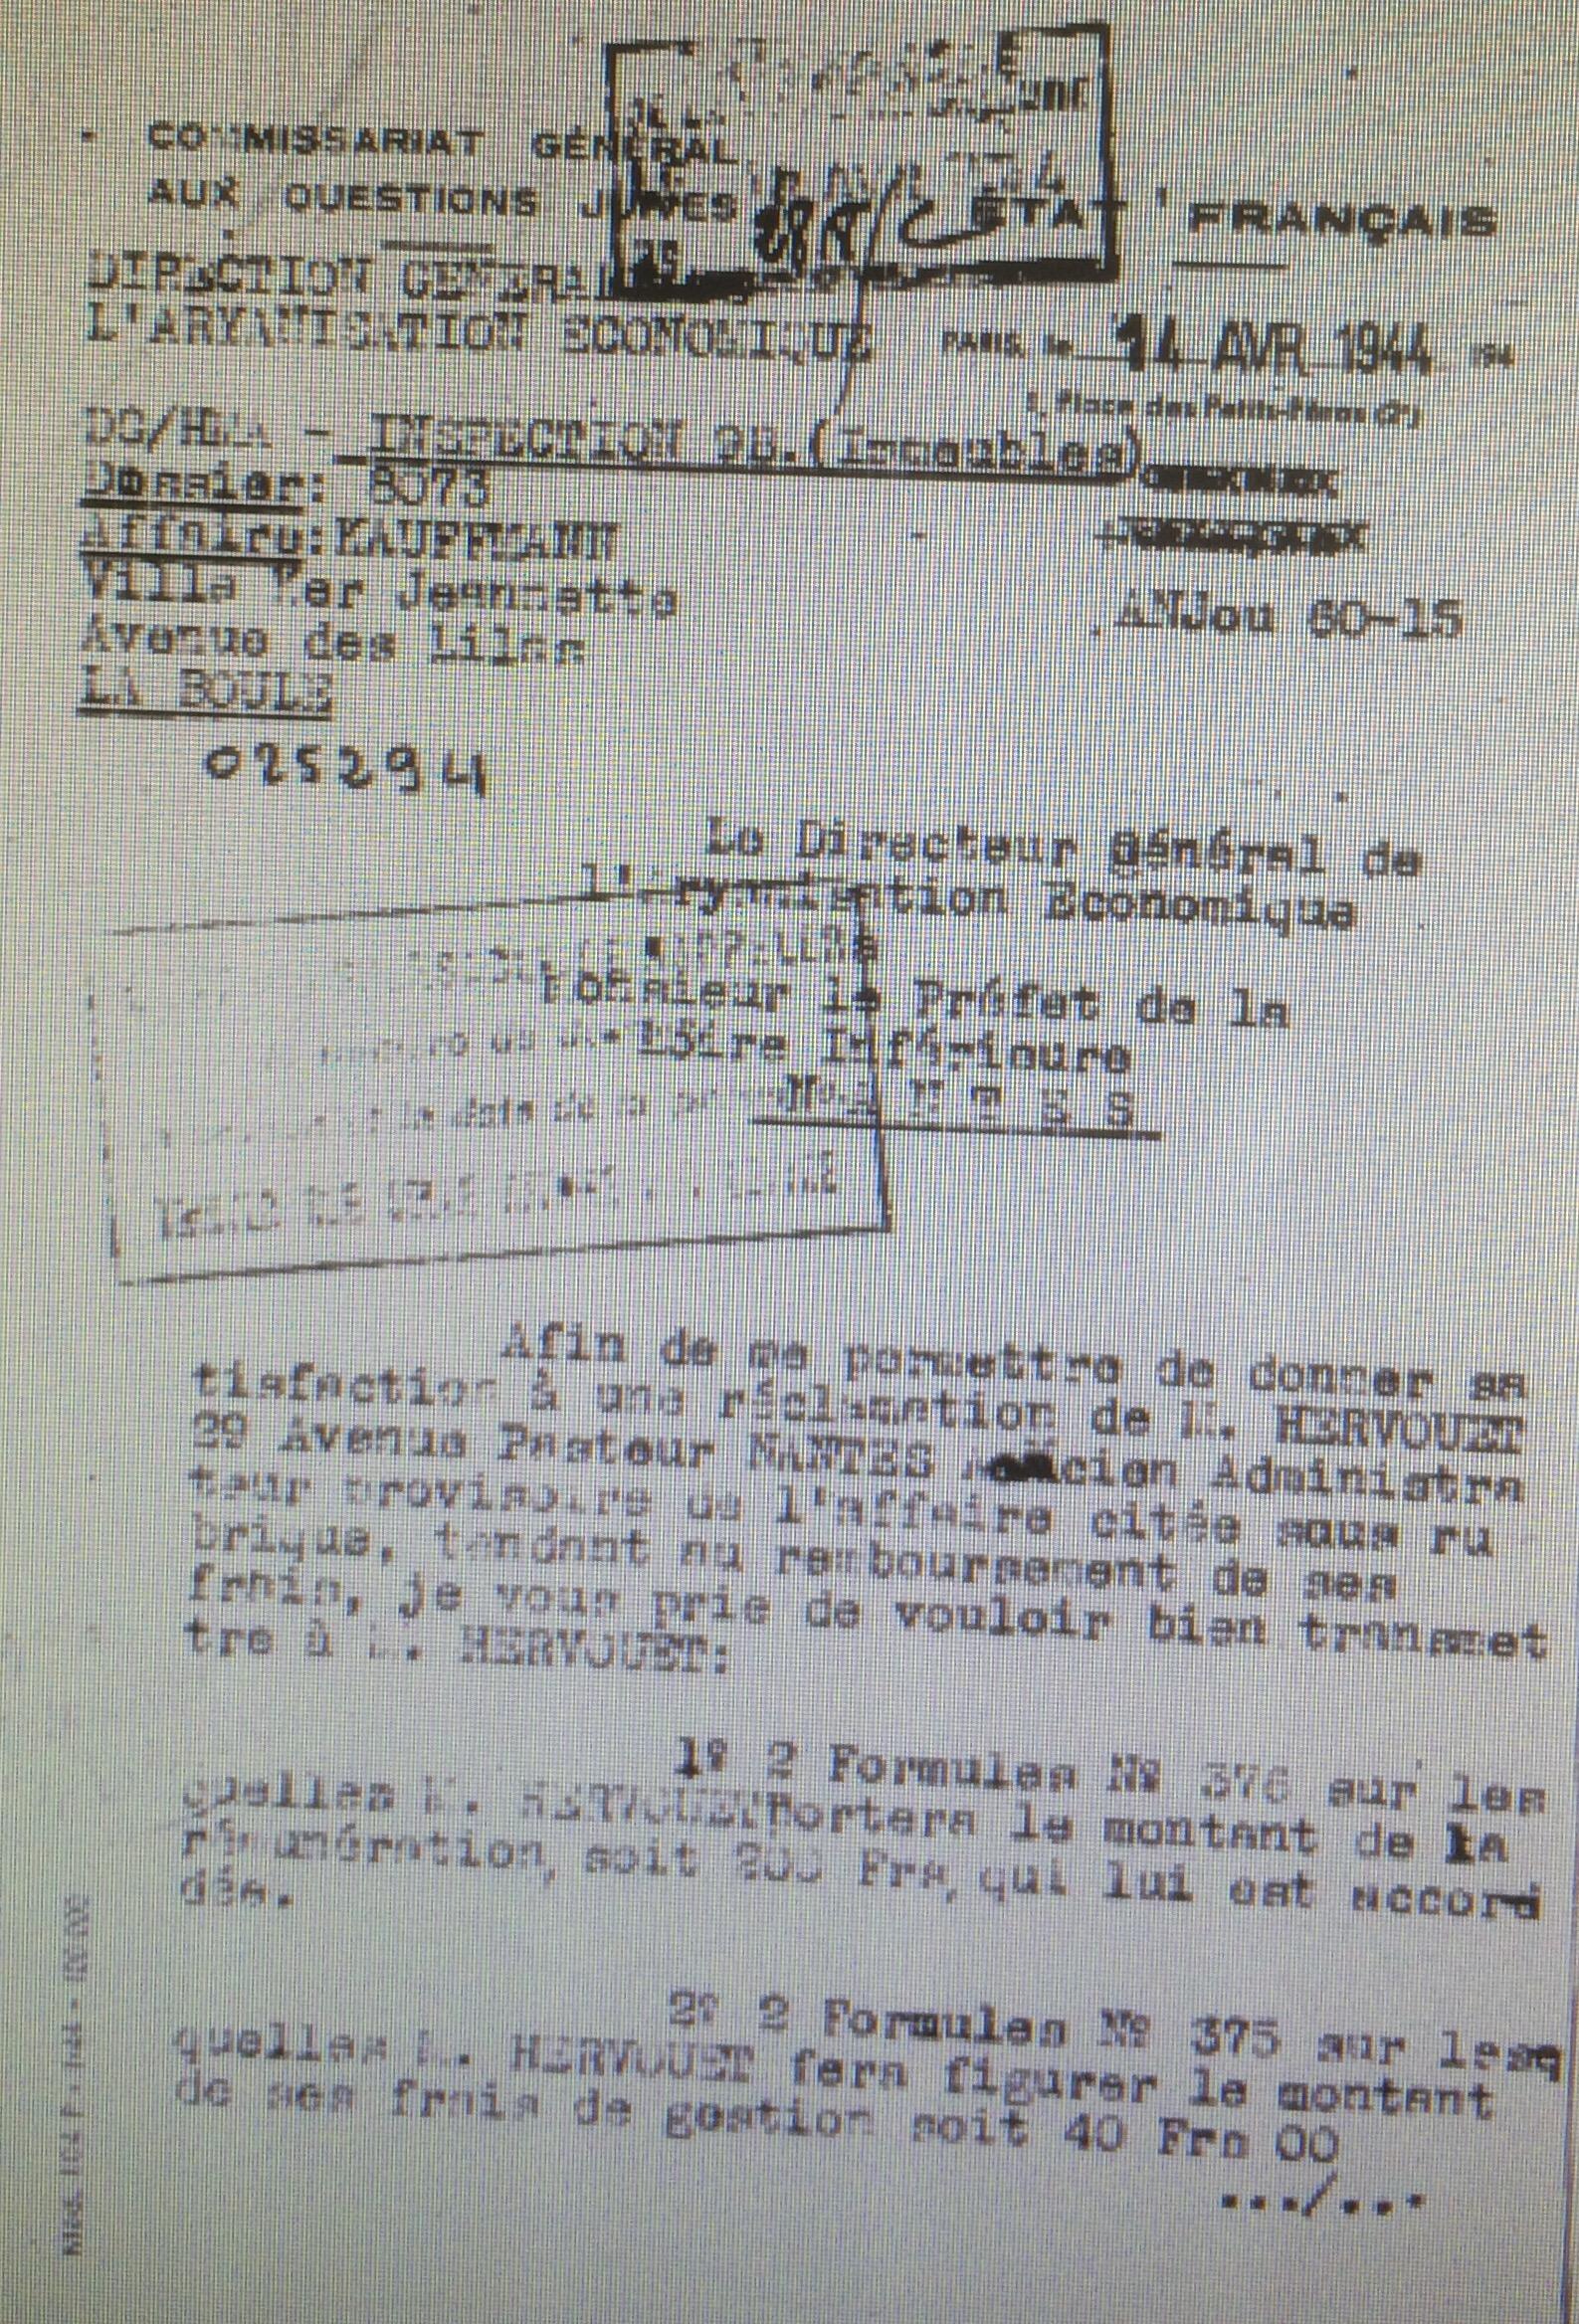 Dossier d'aryanisation KAUFMANN Louis [CGQJ, AN AJ38/4600 dossier n°8073]